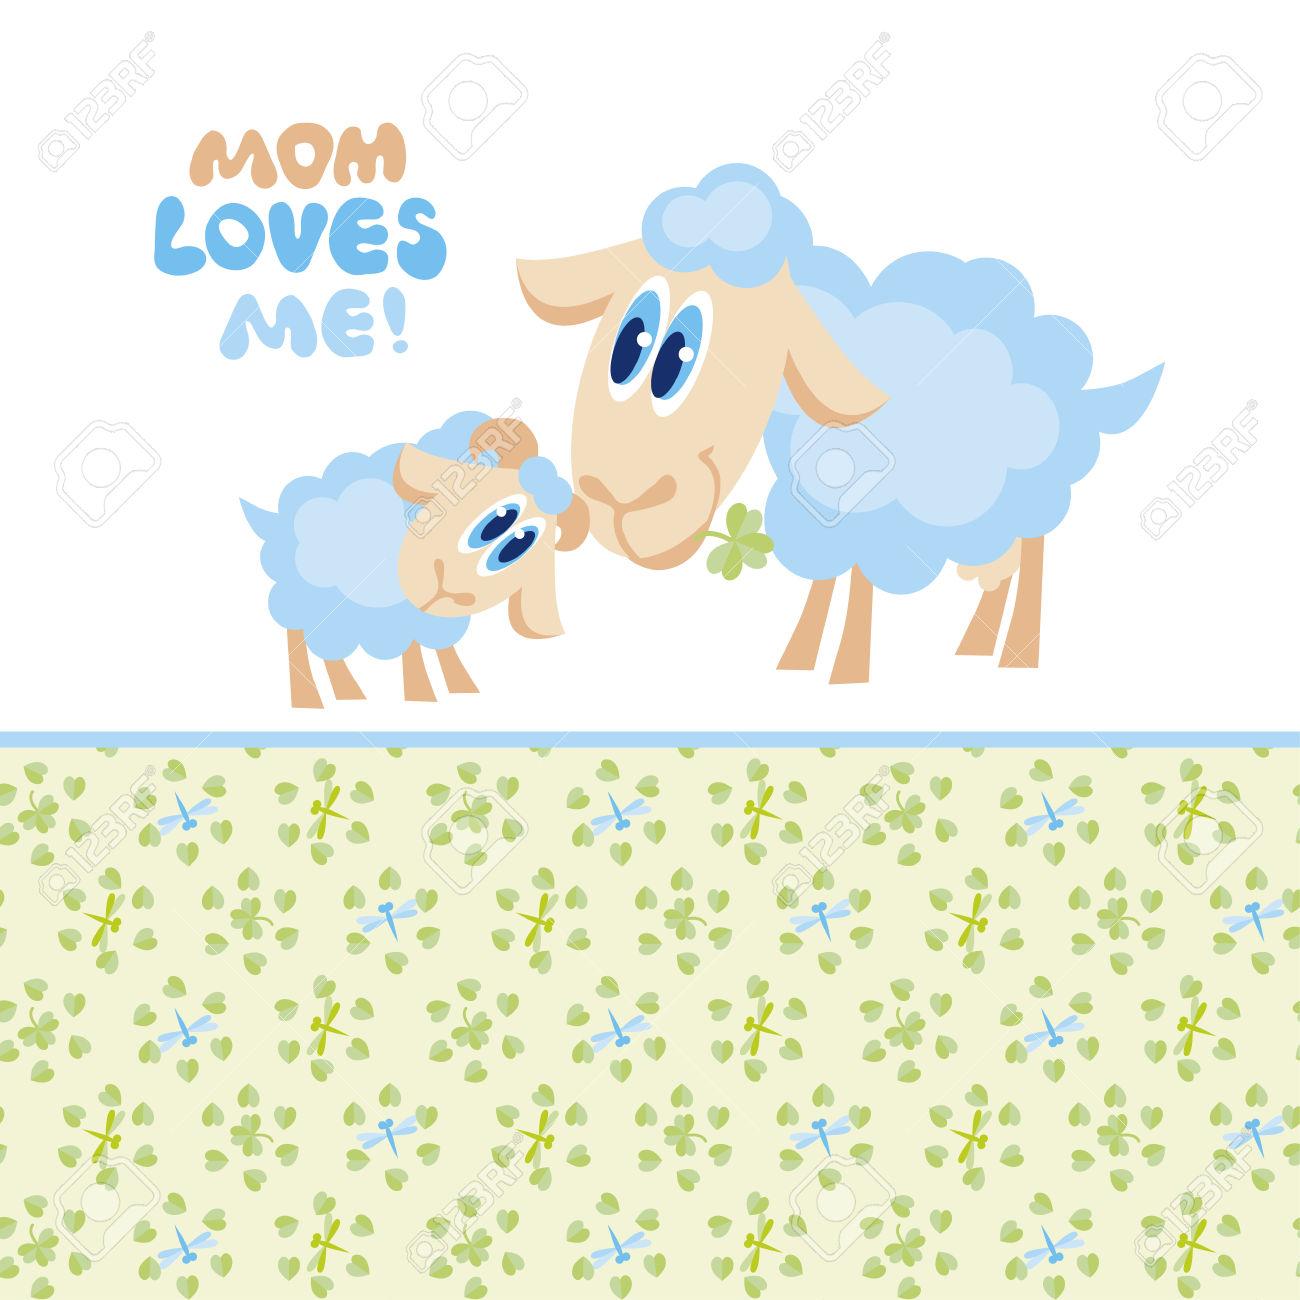 Mama and baby sheep clipart jpg library Illustration Of Sheep Mom And Baby Royalty Free Cliparts, Vectors ... jpg library